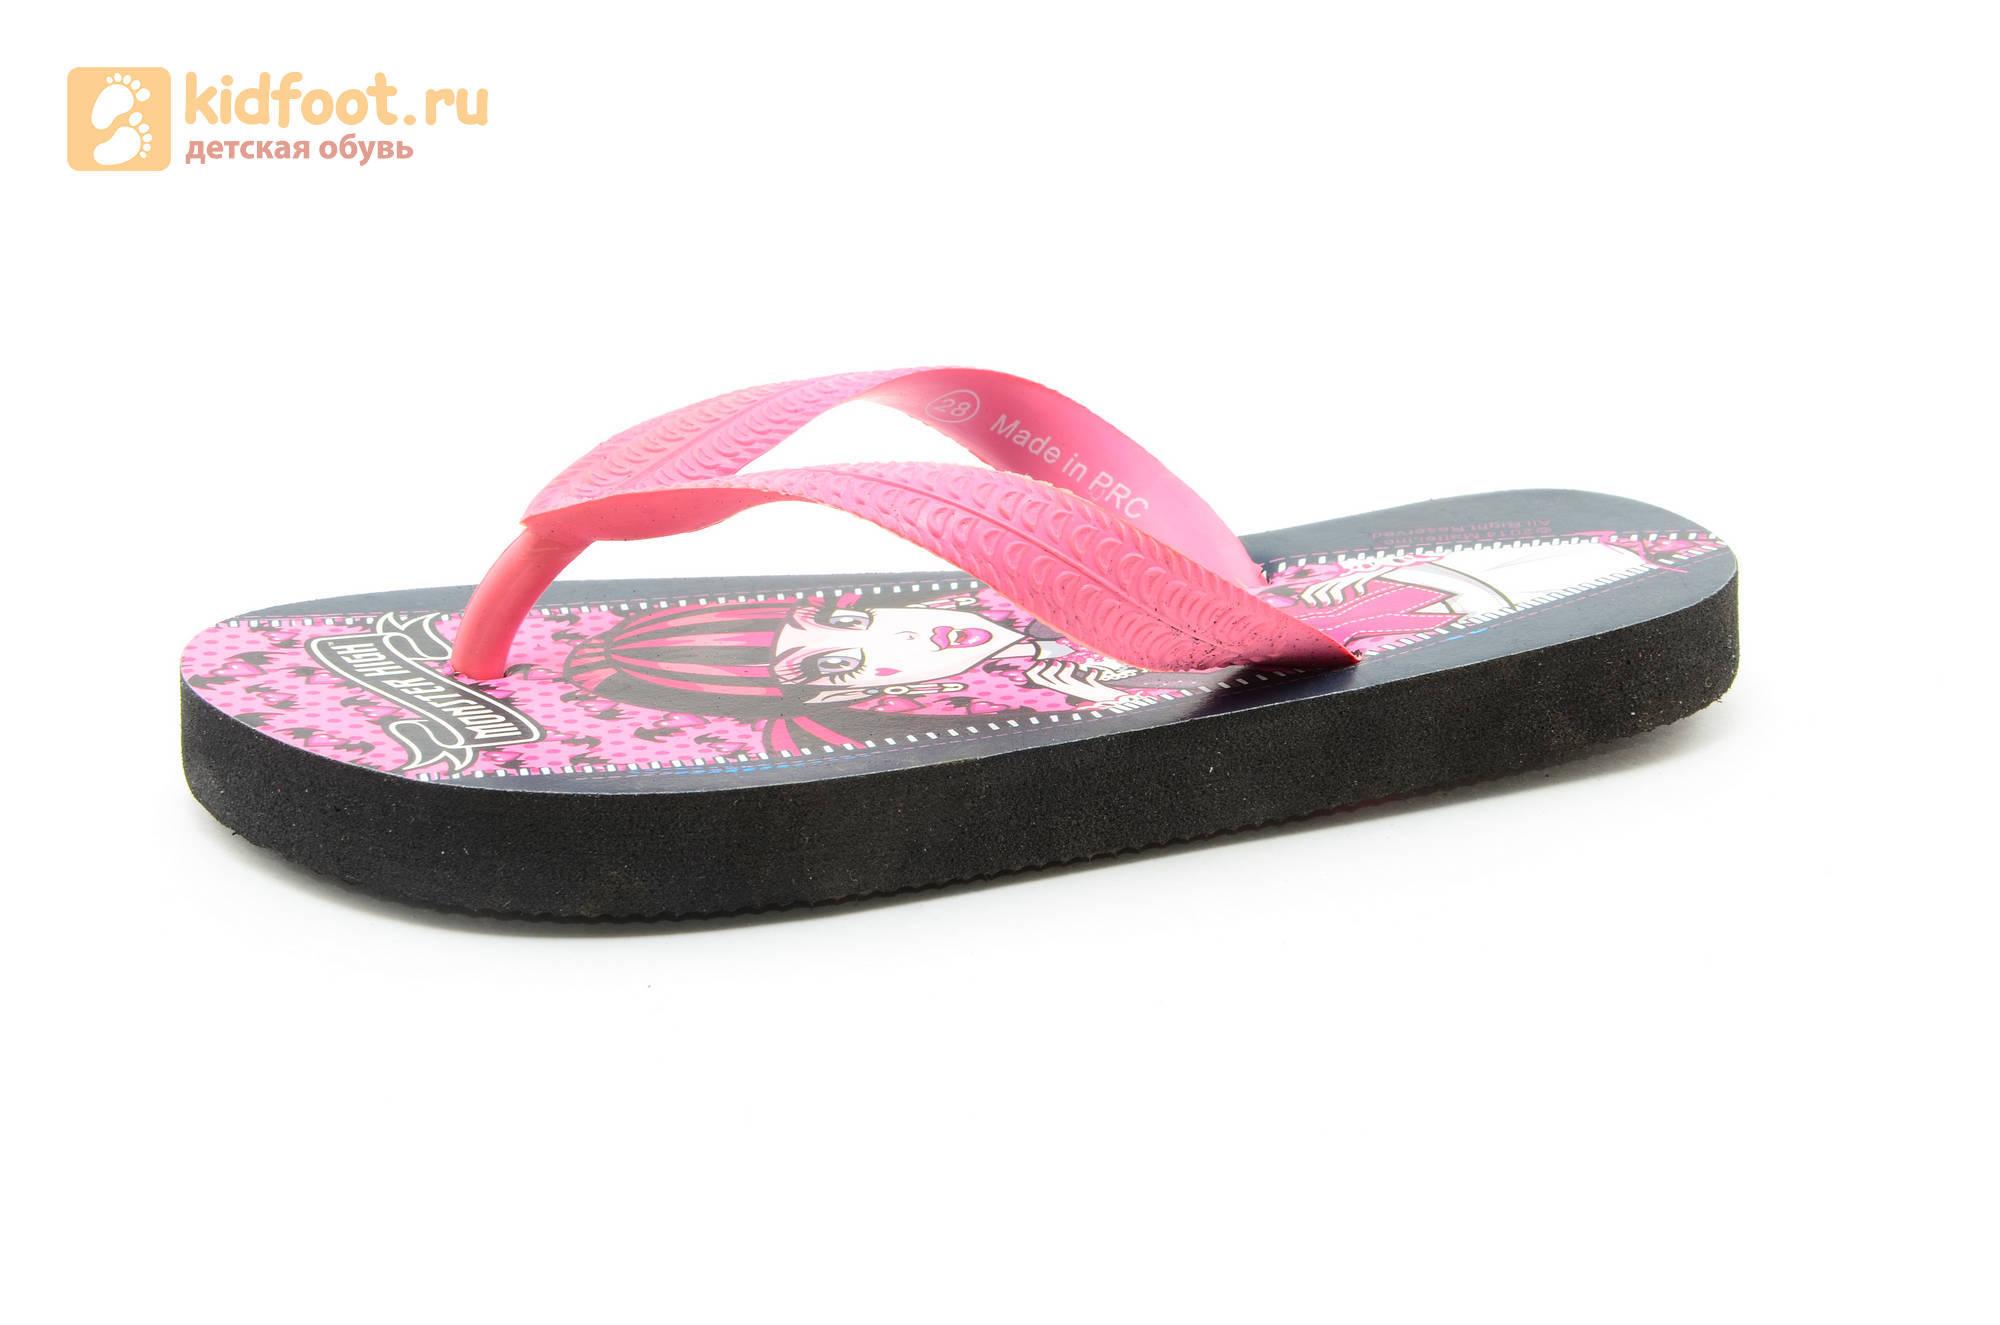 Шлепанцы Монстер Хай (Monster High) пляжные сланцы для девочек, цвет черный розовый